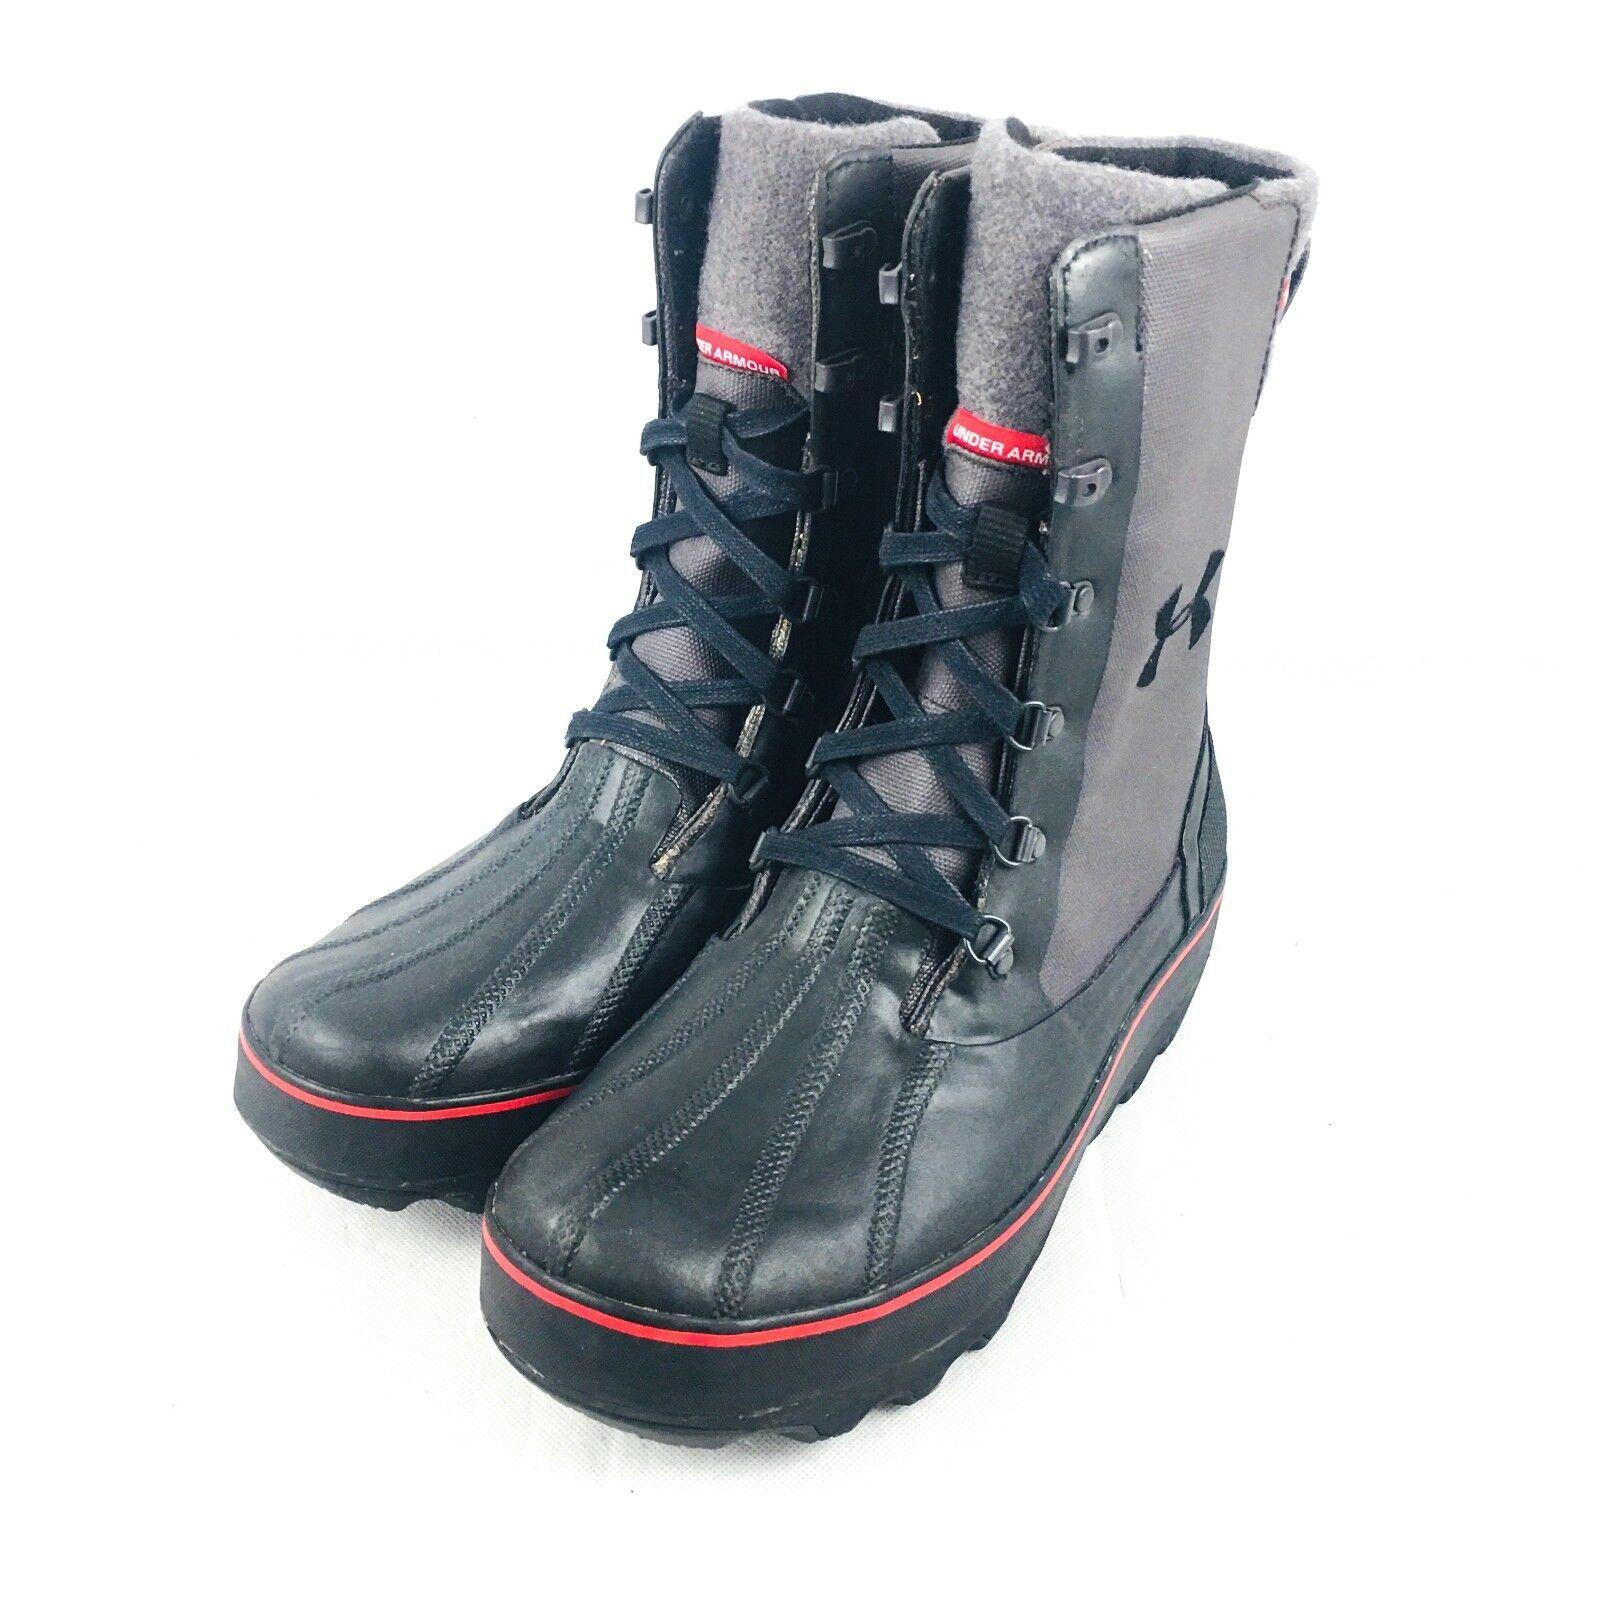 Under Armour Clackamas 200 Gram 1250238-001 Primaloft Insulated Stiefel Mens 10.5